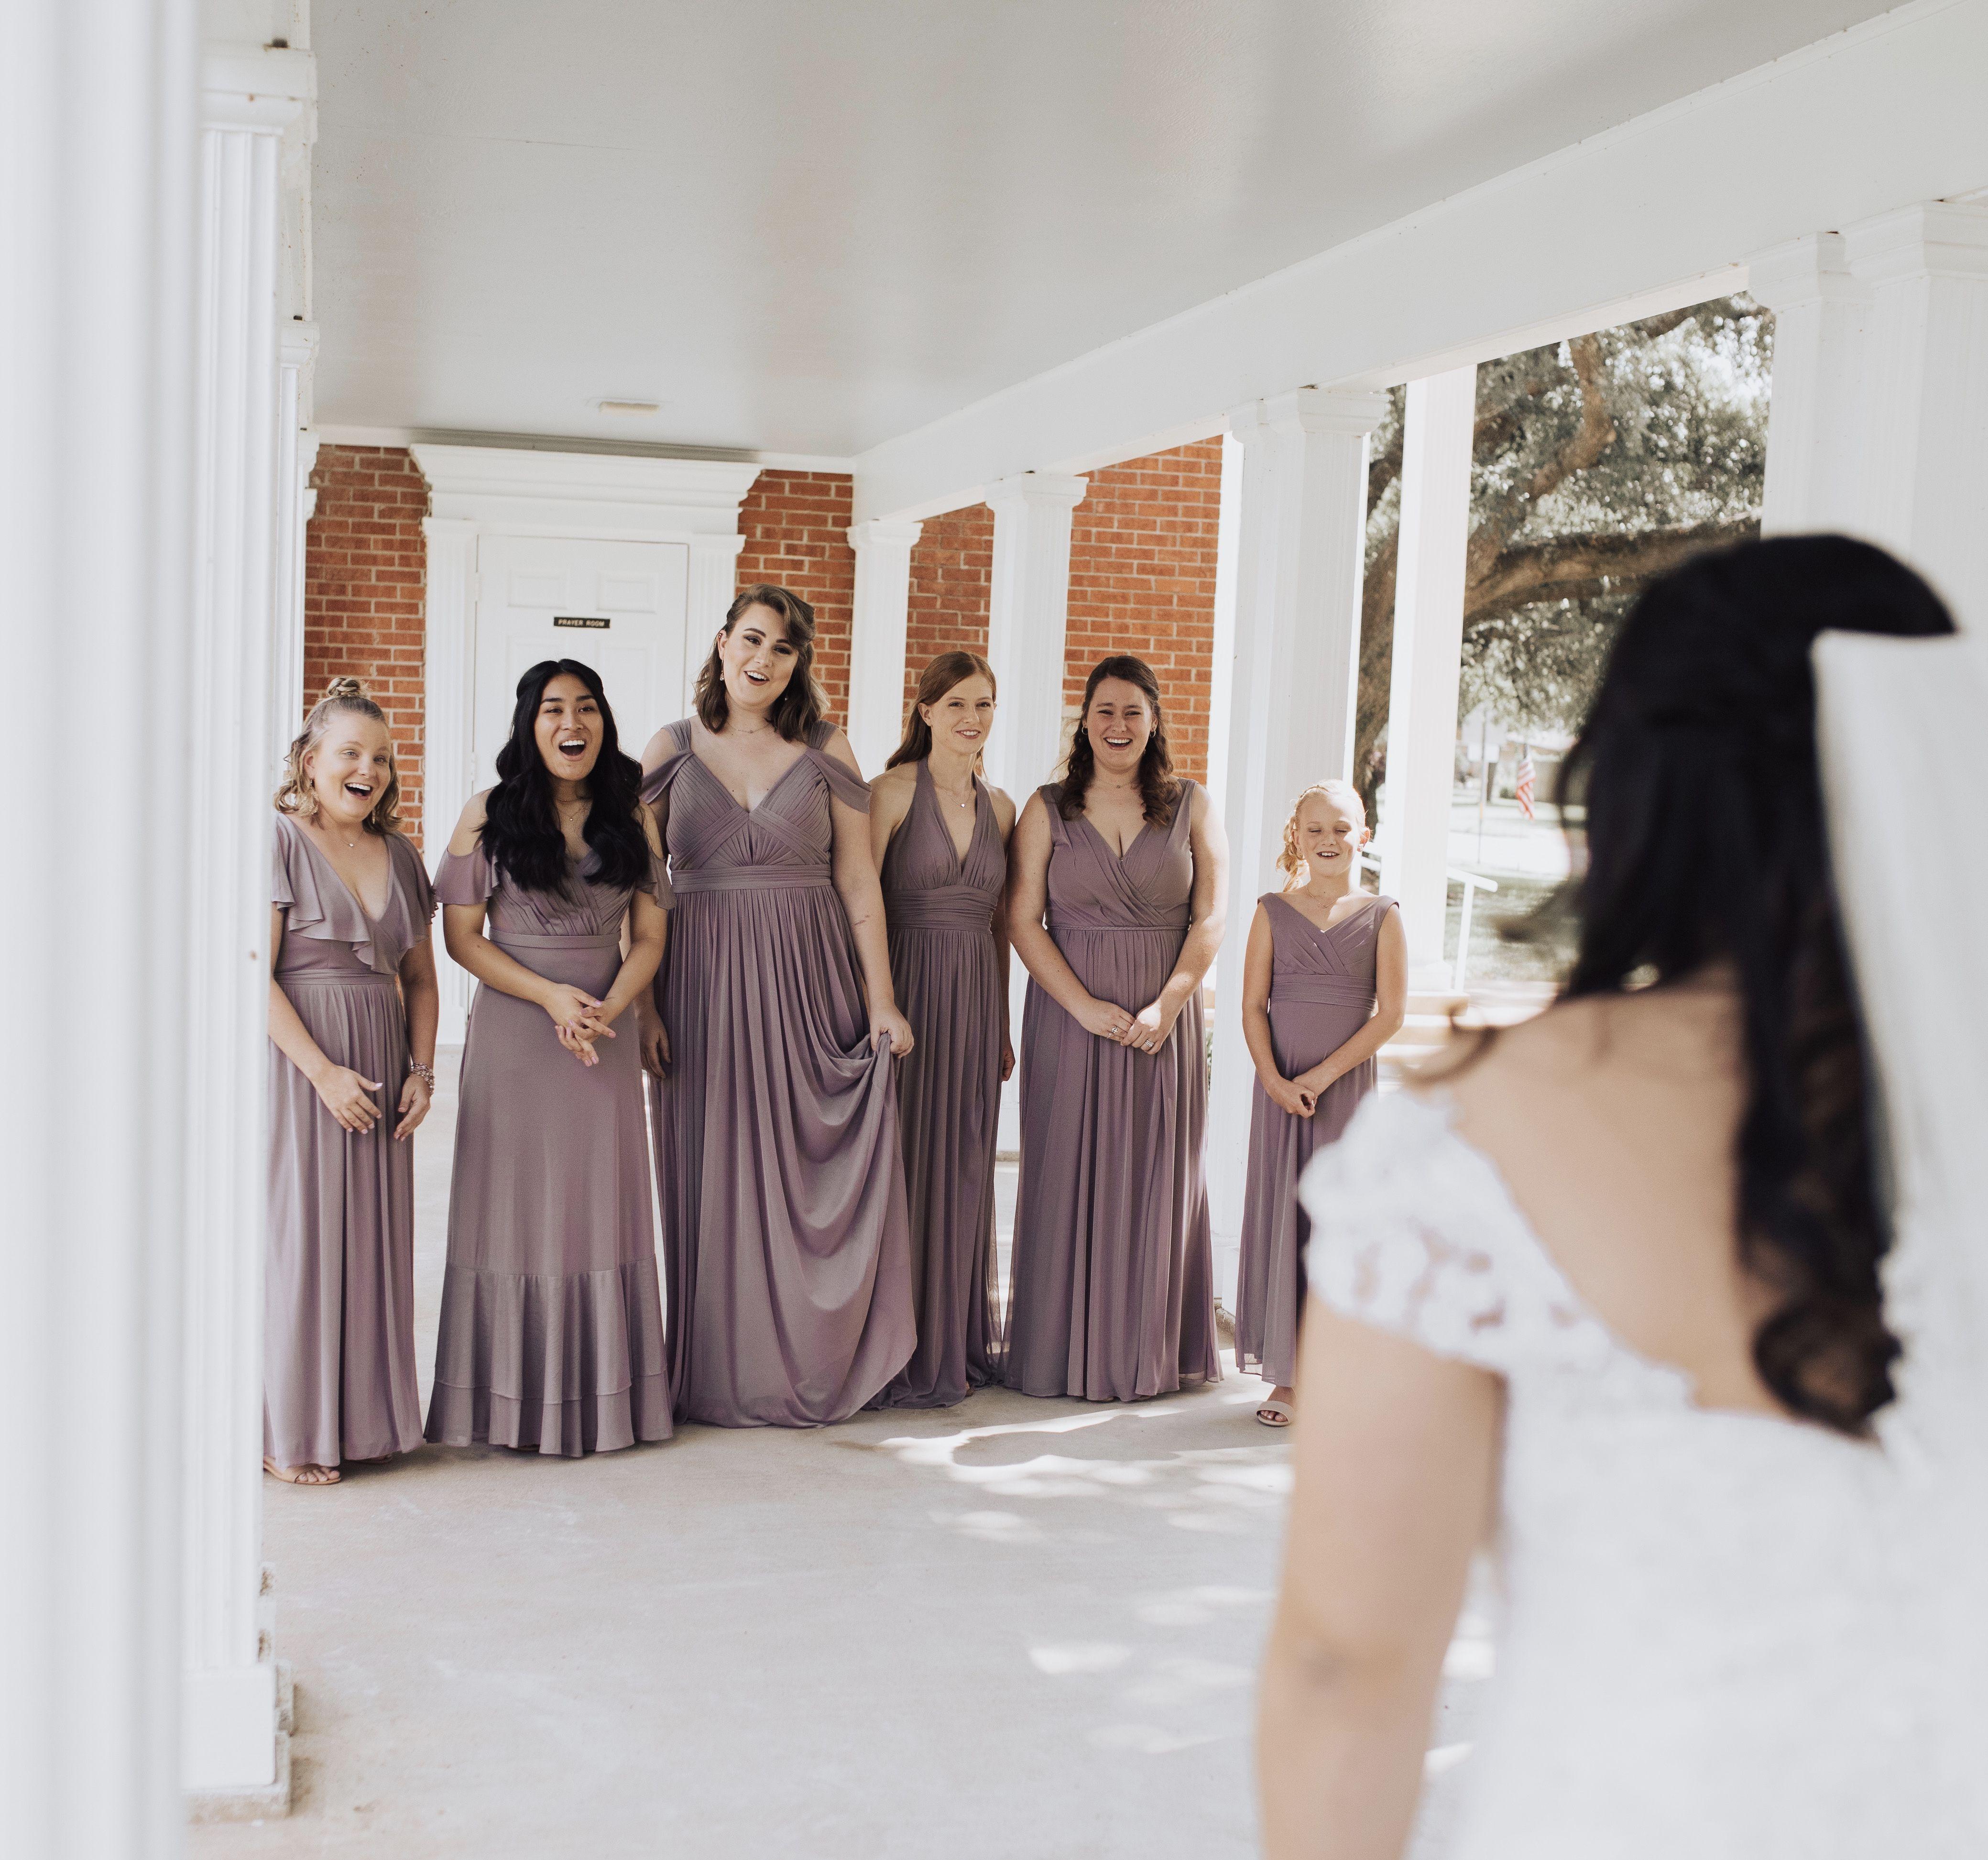 Pin By Brooke Figueiredo On Wedding